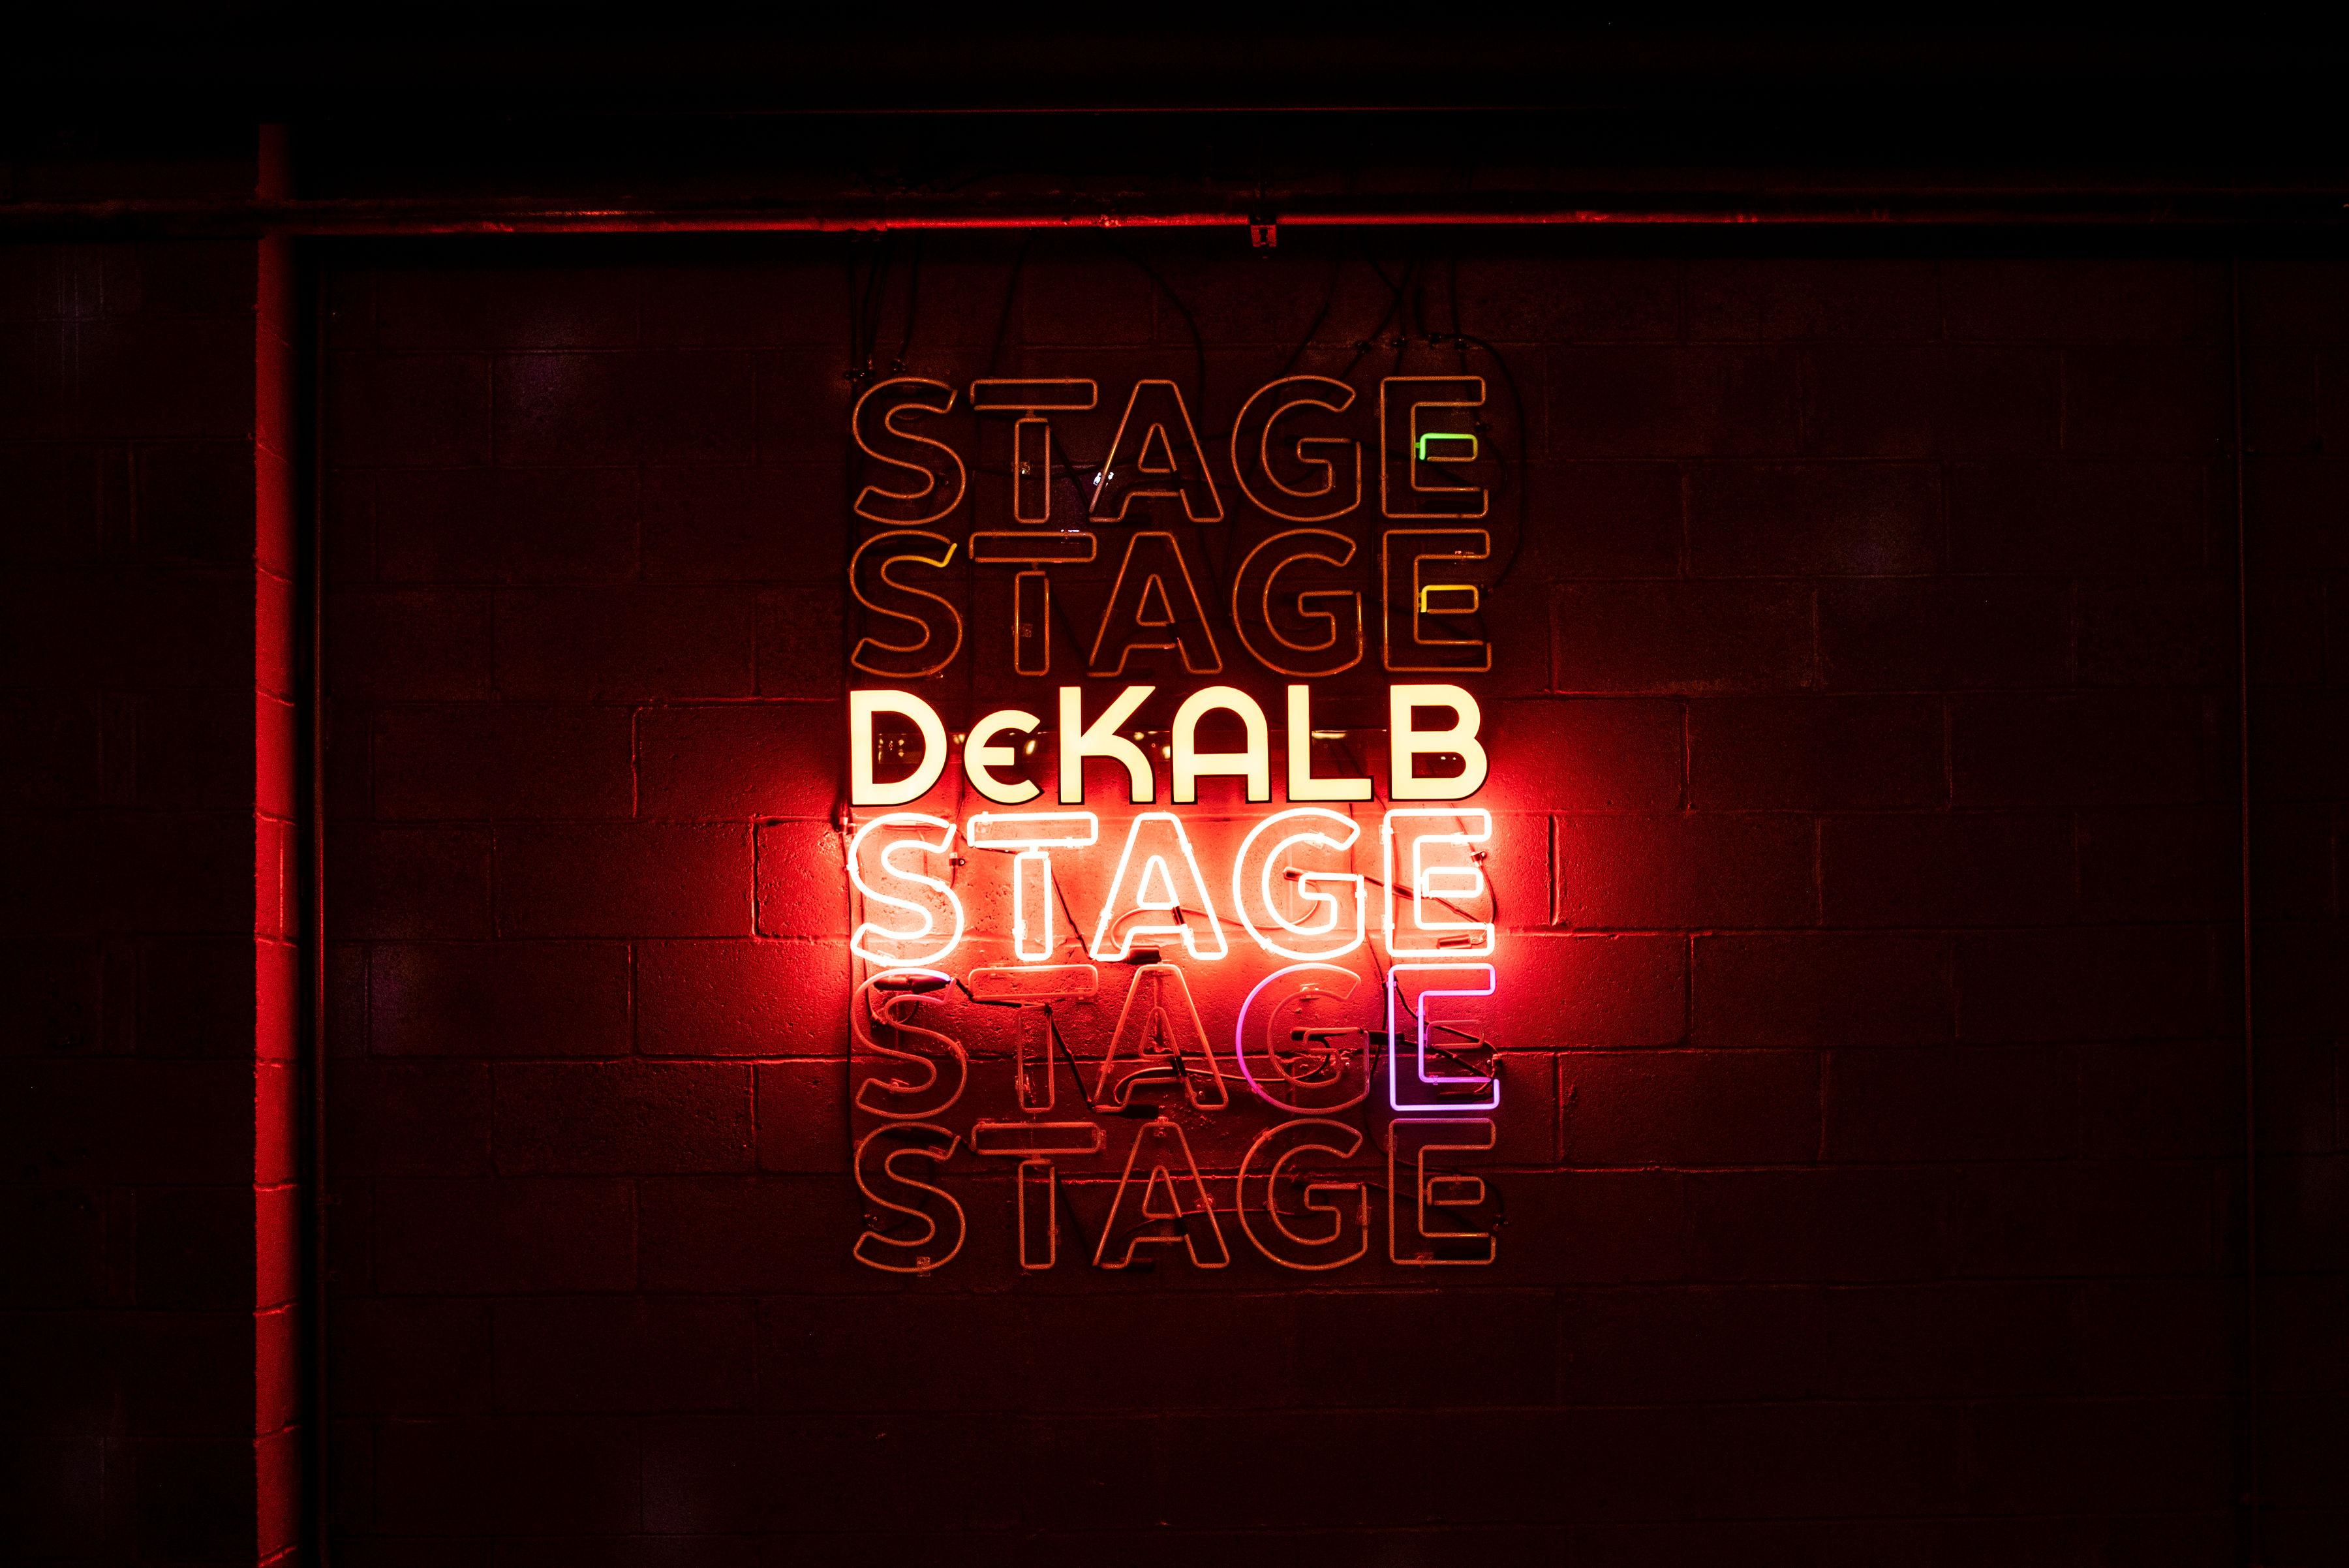 Dekalb Stage, understudy, dekalb market, city point, 445 Albee Square West